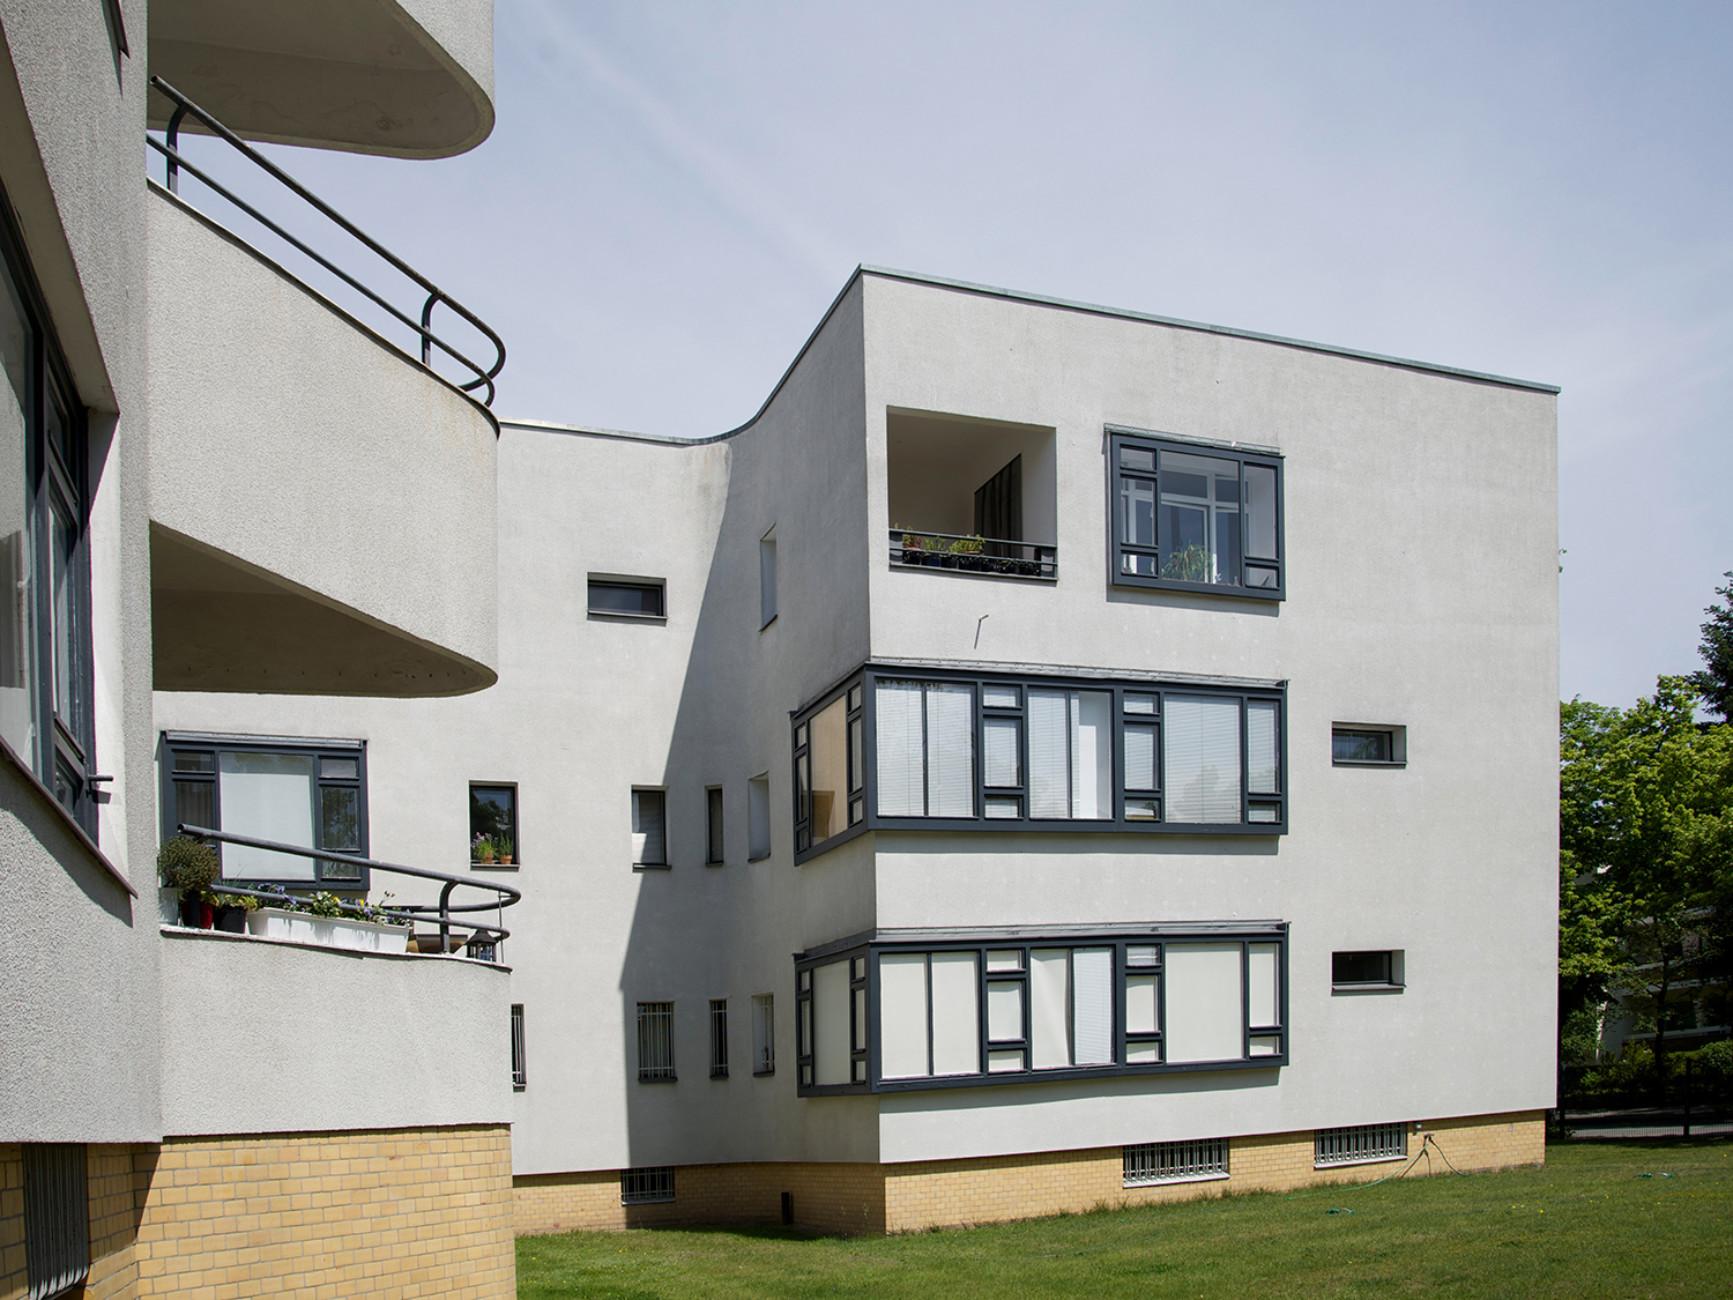 Residential development at Flensburger Platz, Berlin Wilmersdorf (1931-1932)